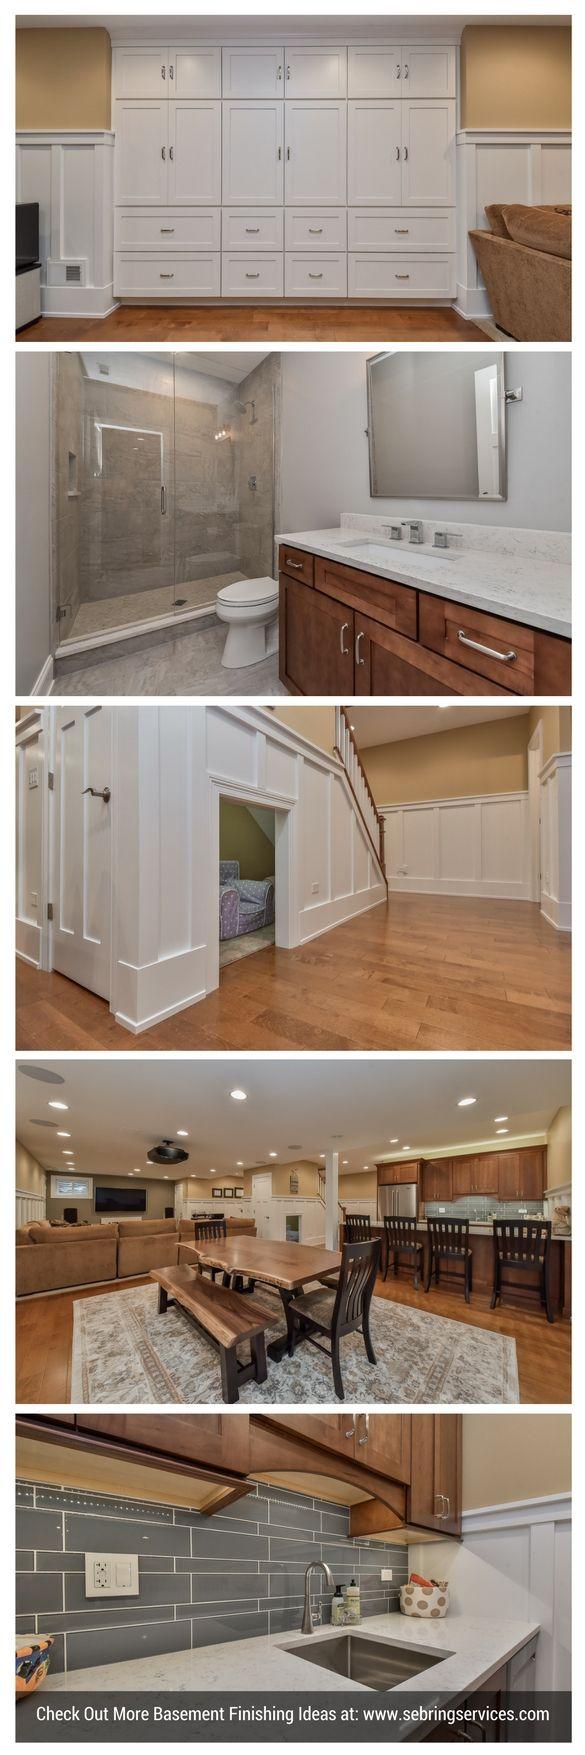 Basement Remodeling Naperville Il a naperville illinois basement remodel pictures | basements, cozy